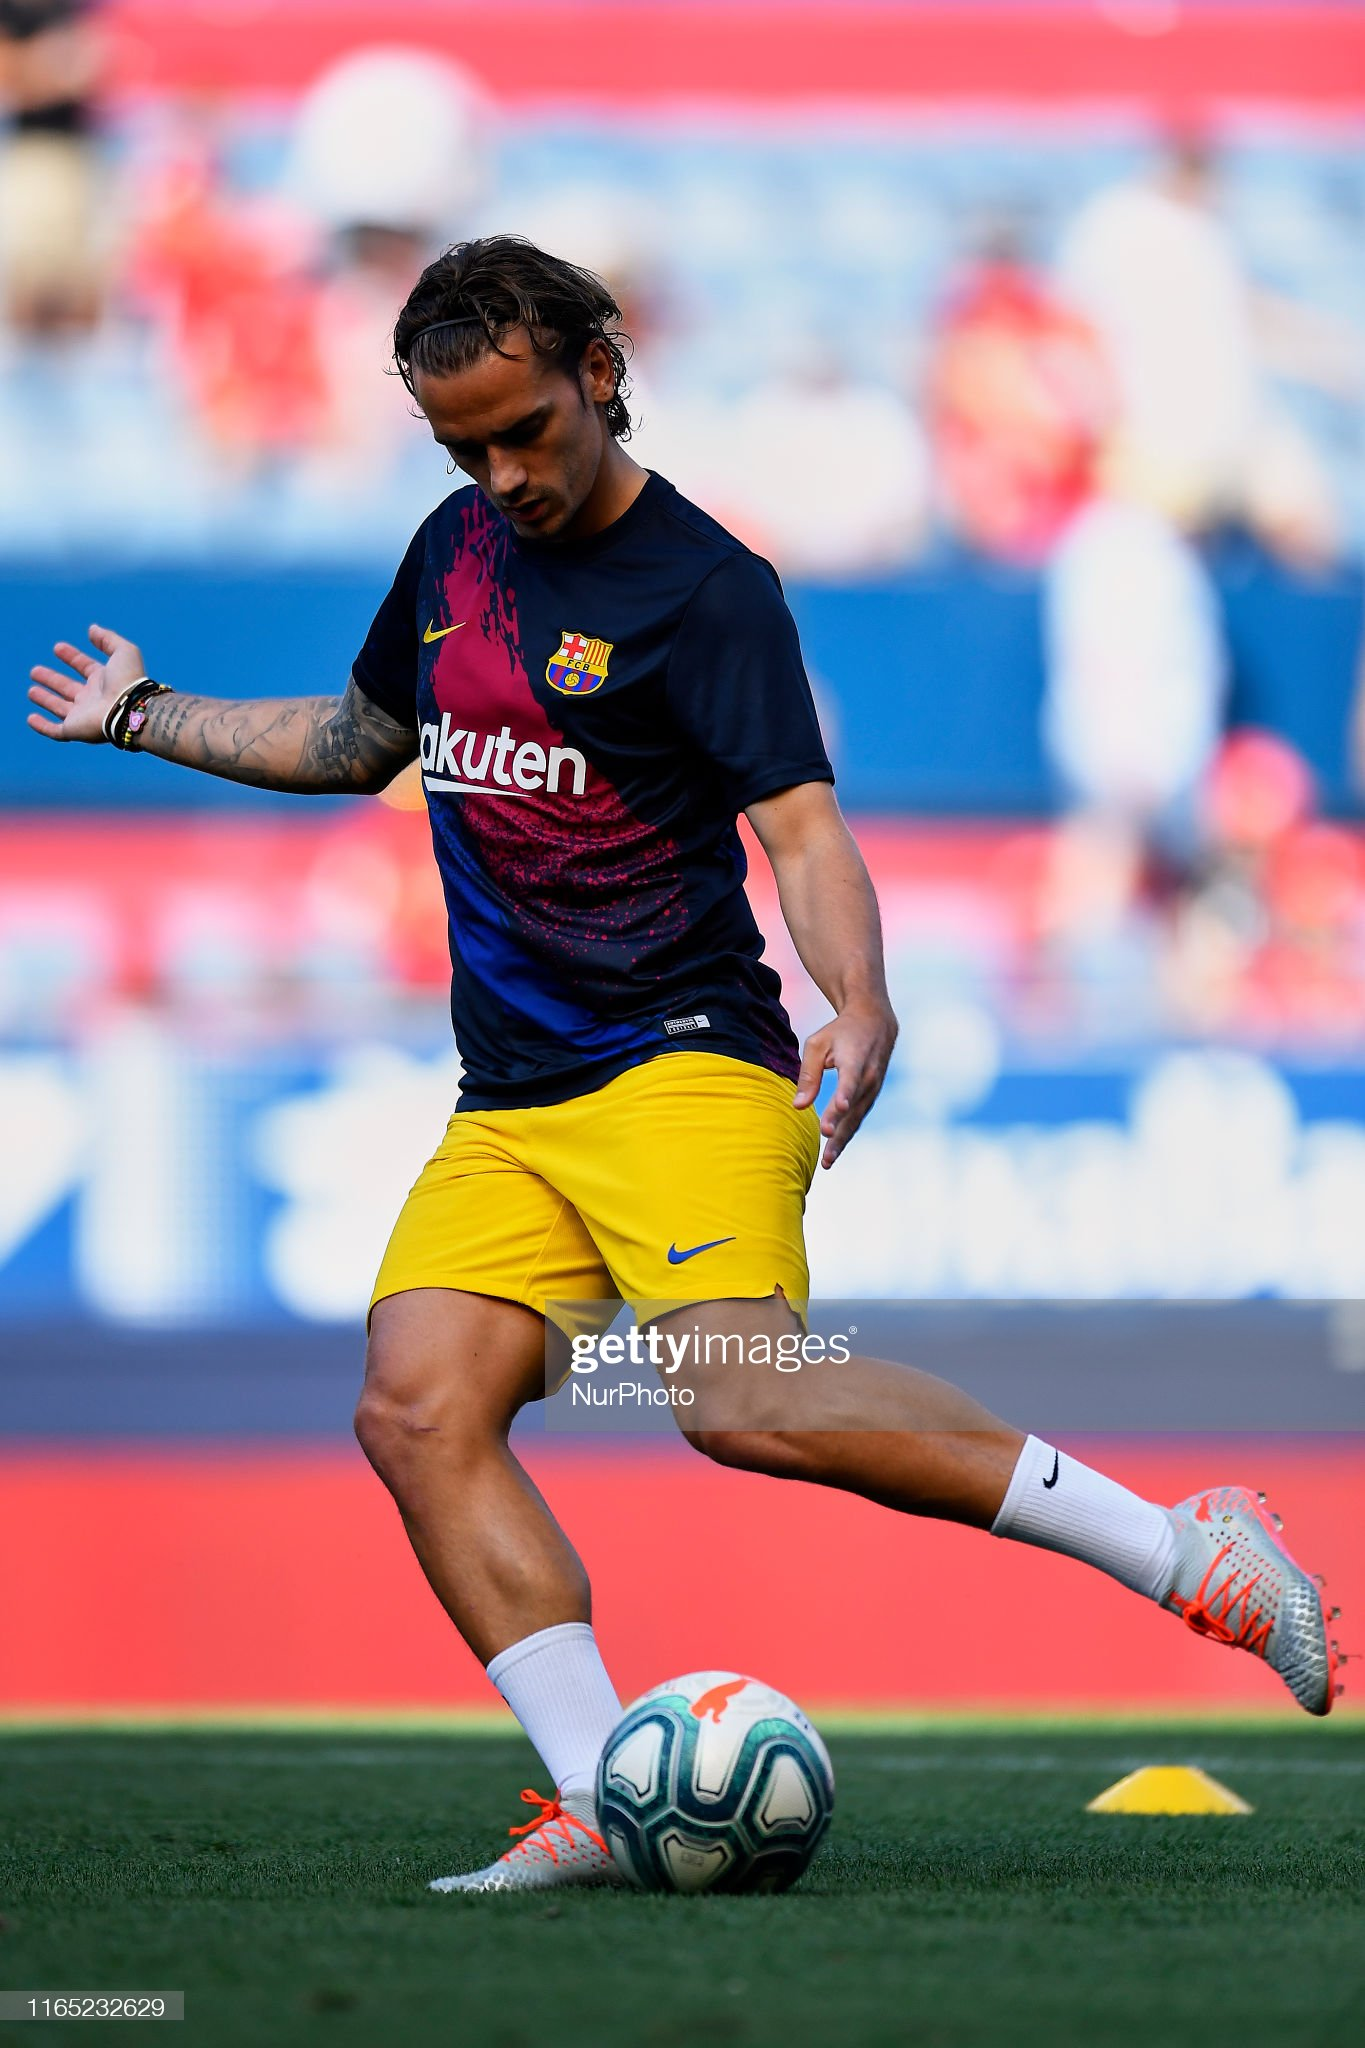 صور مباراة : أوساسونا - برشلونة 2-2 ( 31-08-2019 )  Antoine-griezmann-of-barcelona-during-the-warmup-before-the-liga-ca-picture-id1165232629?s=2048x2048